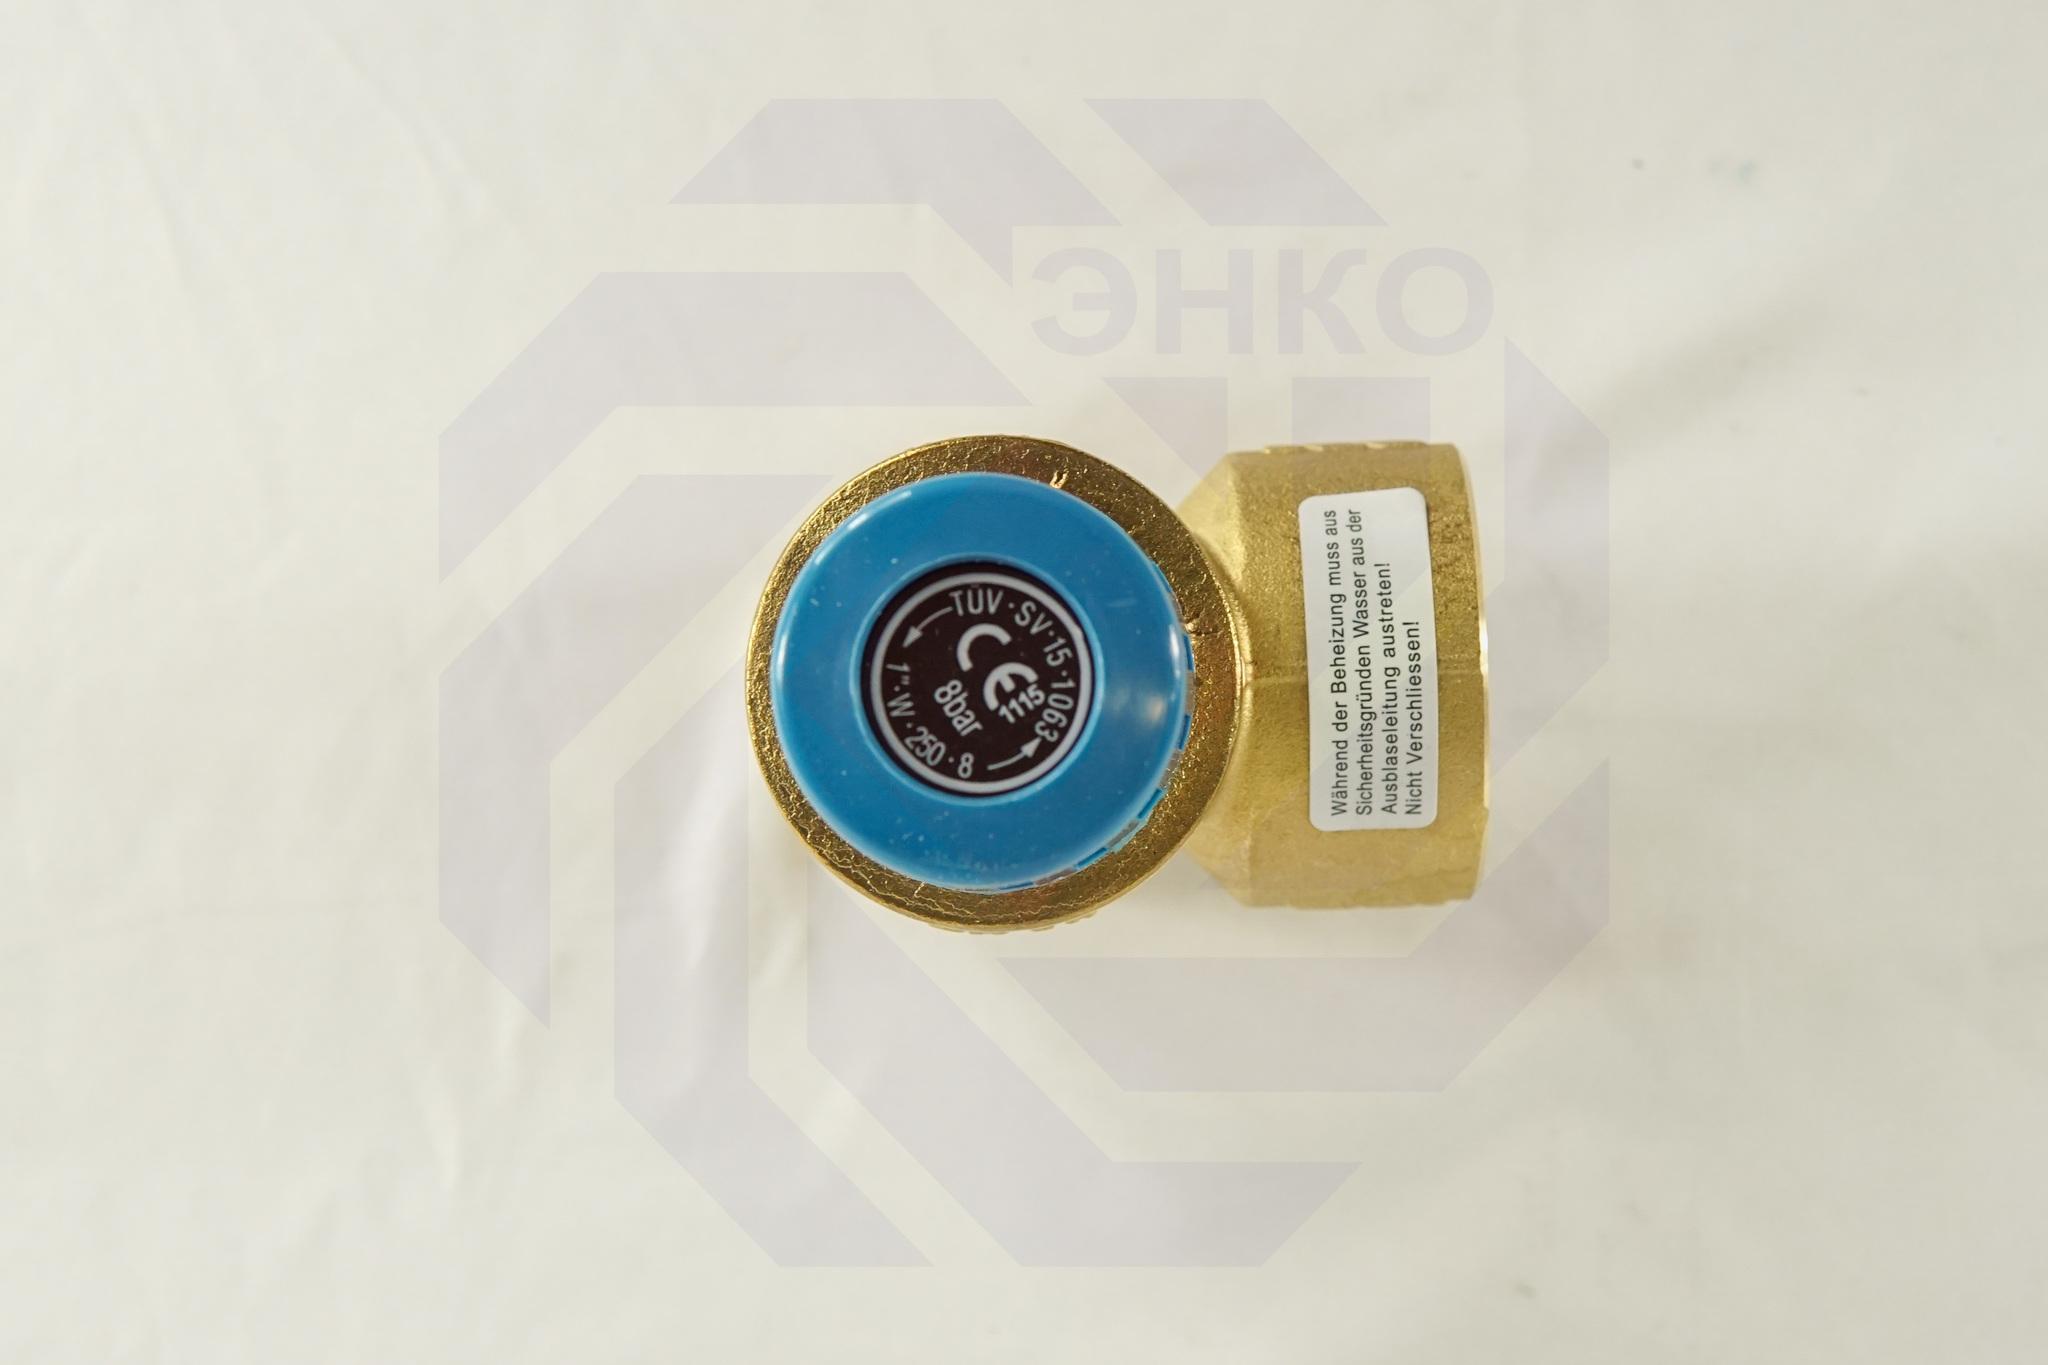 Клапан предохранительный WATTS SVW 8 бар 1